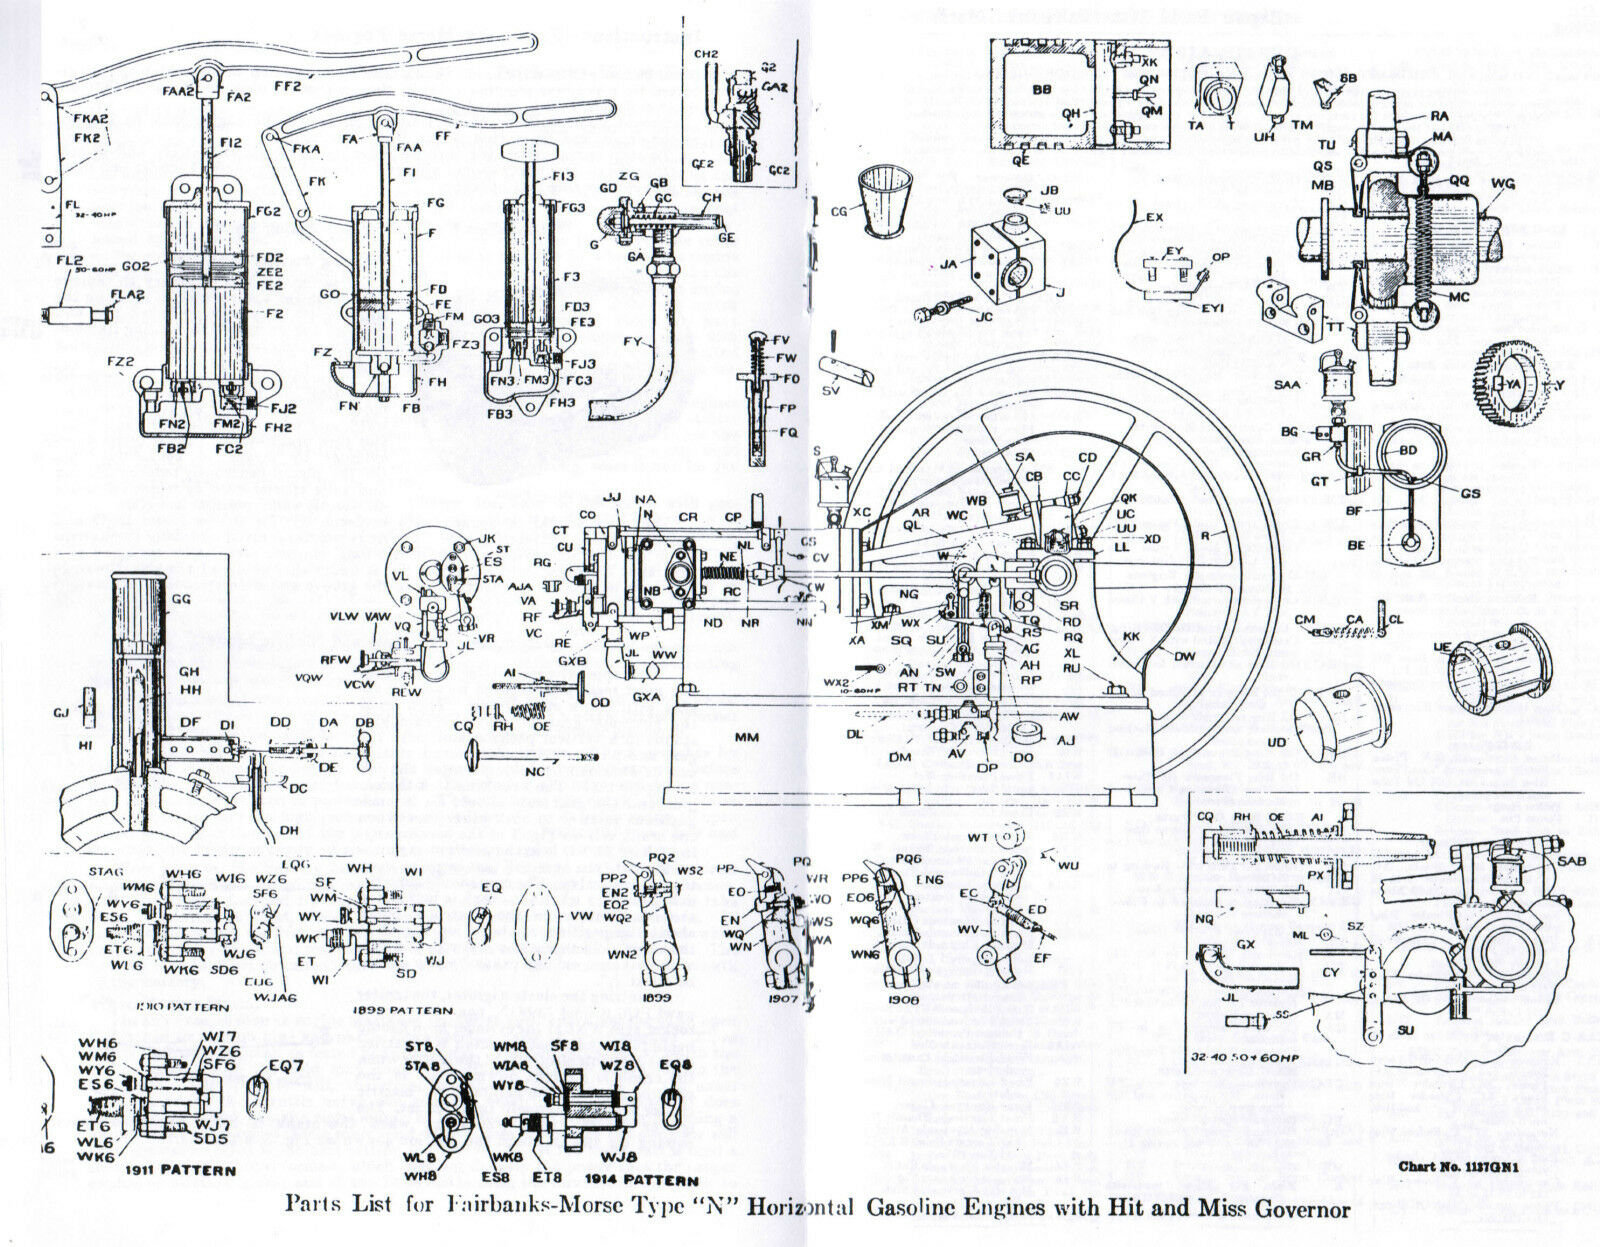 Fairbanks Morse Gas Engine Motor Type N Hit Miss Governor